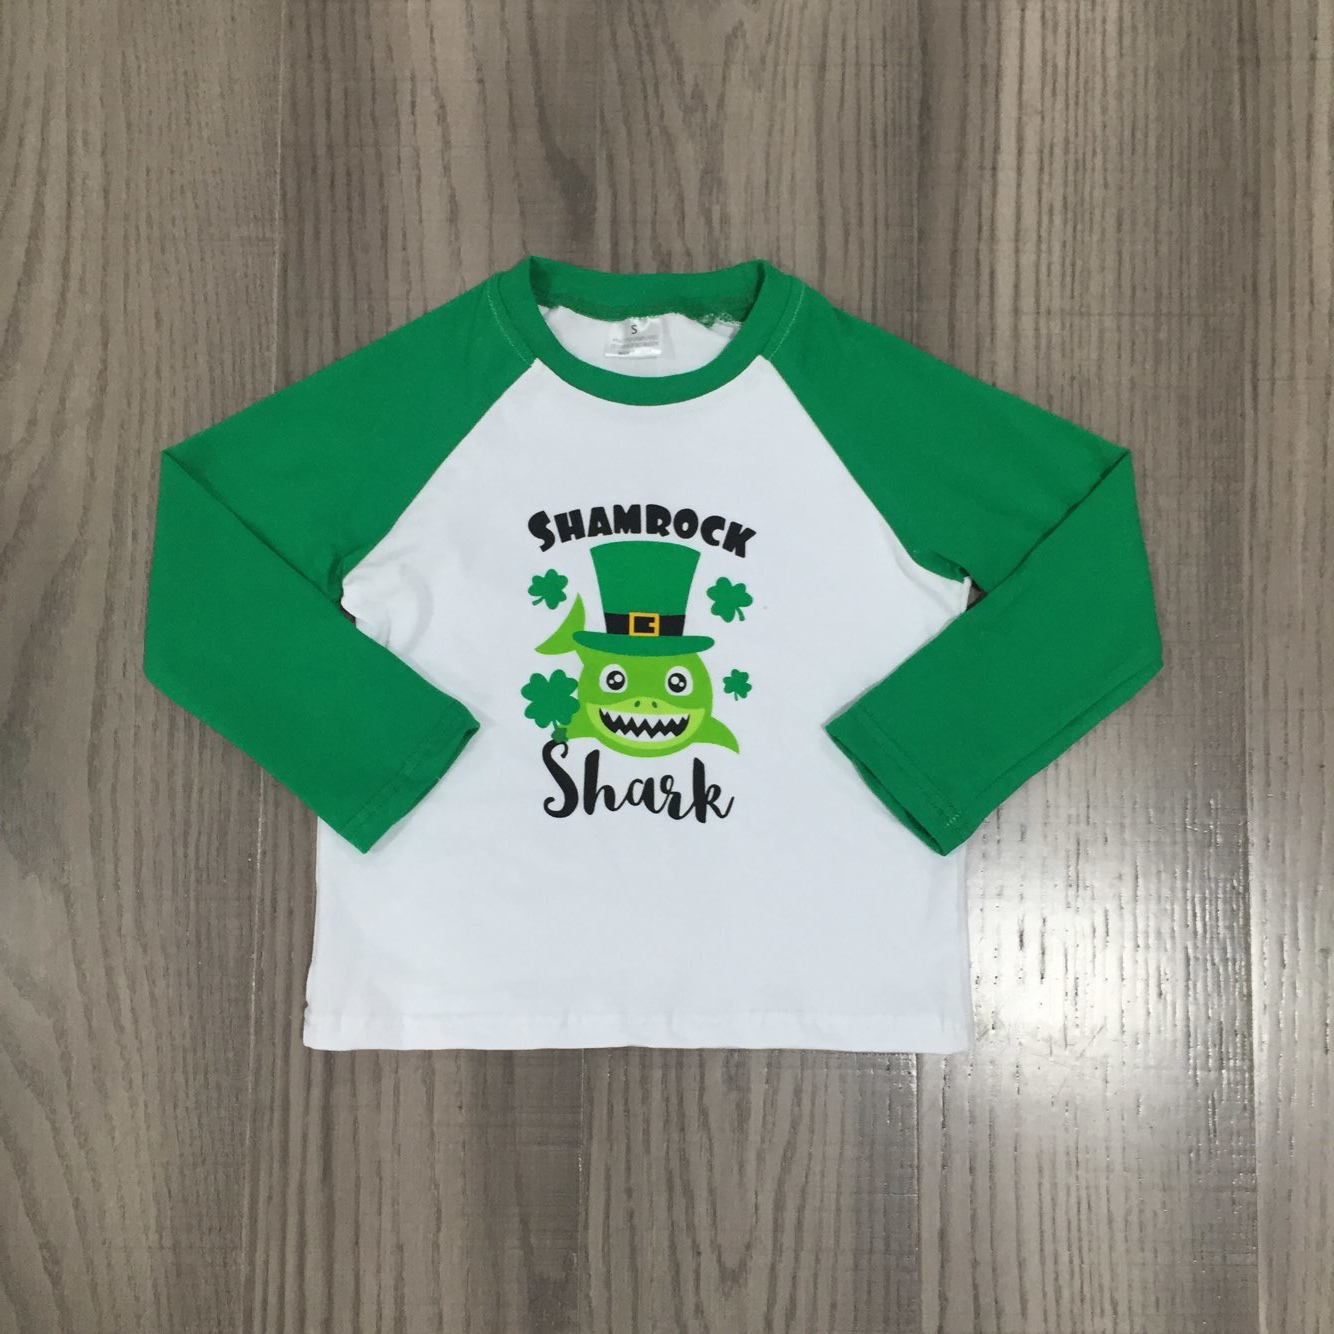 Girlymax Spring St Patrick Baby Boys Long Sleeve Cotton Boutique Top T-shirt Raglans Clothes Lucky Shark Shamrocks Clover 3